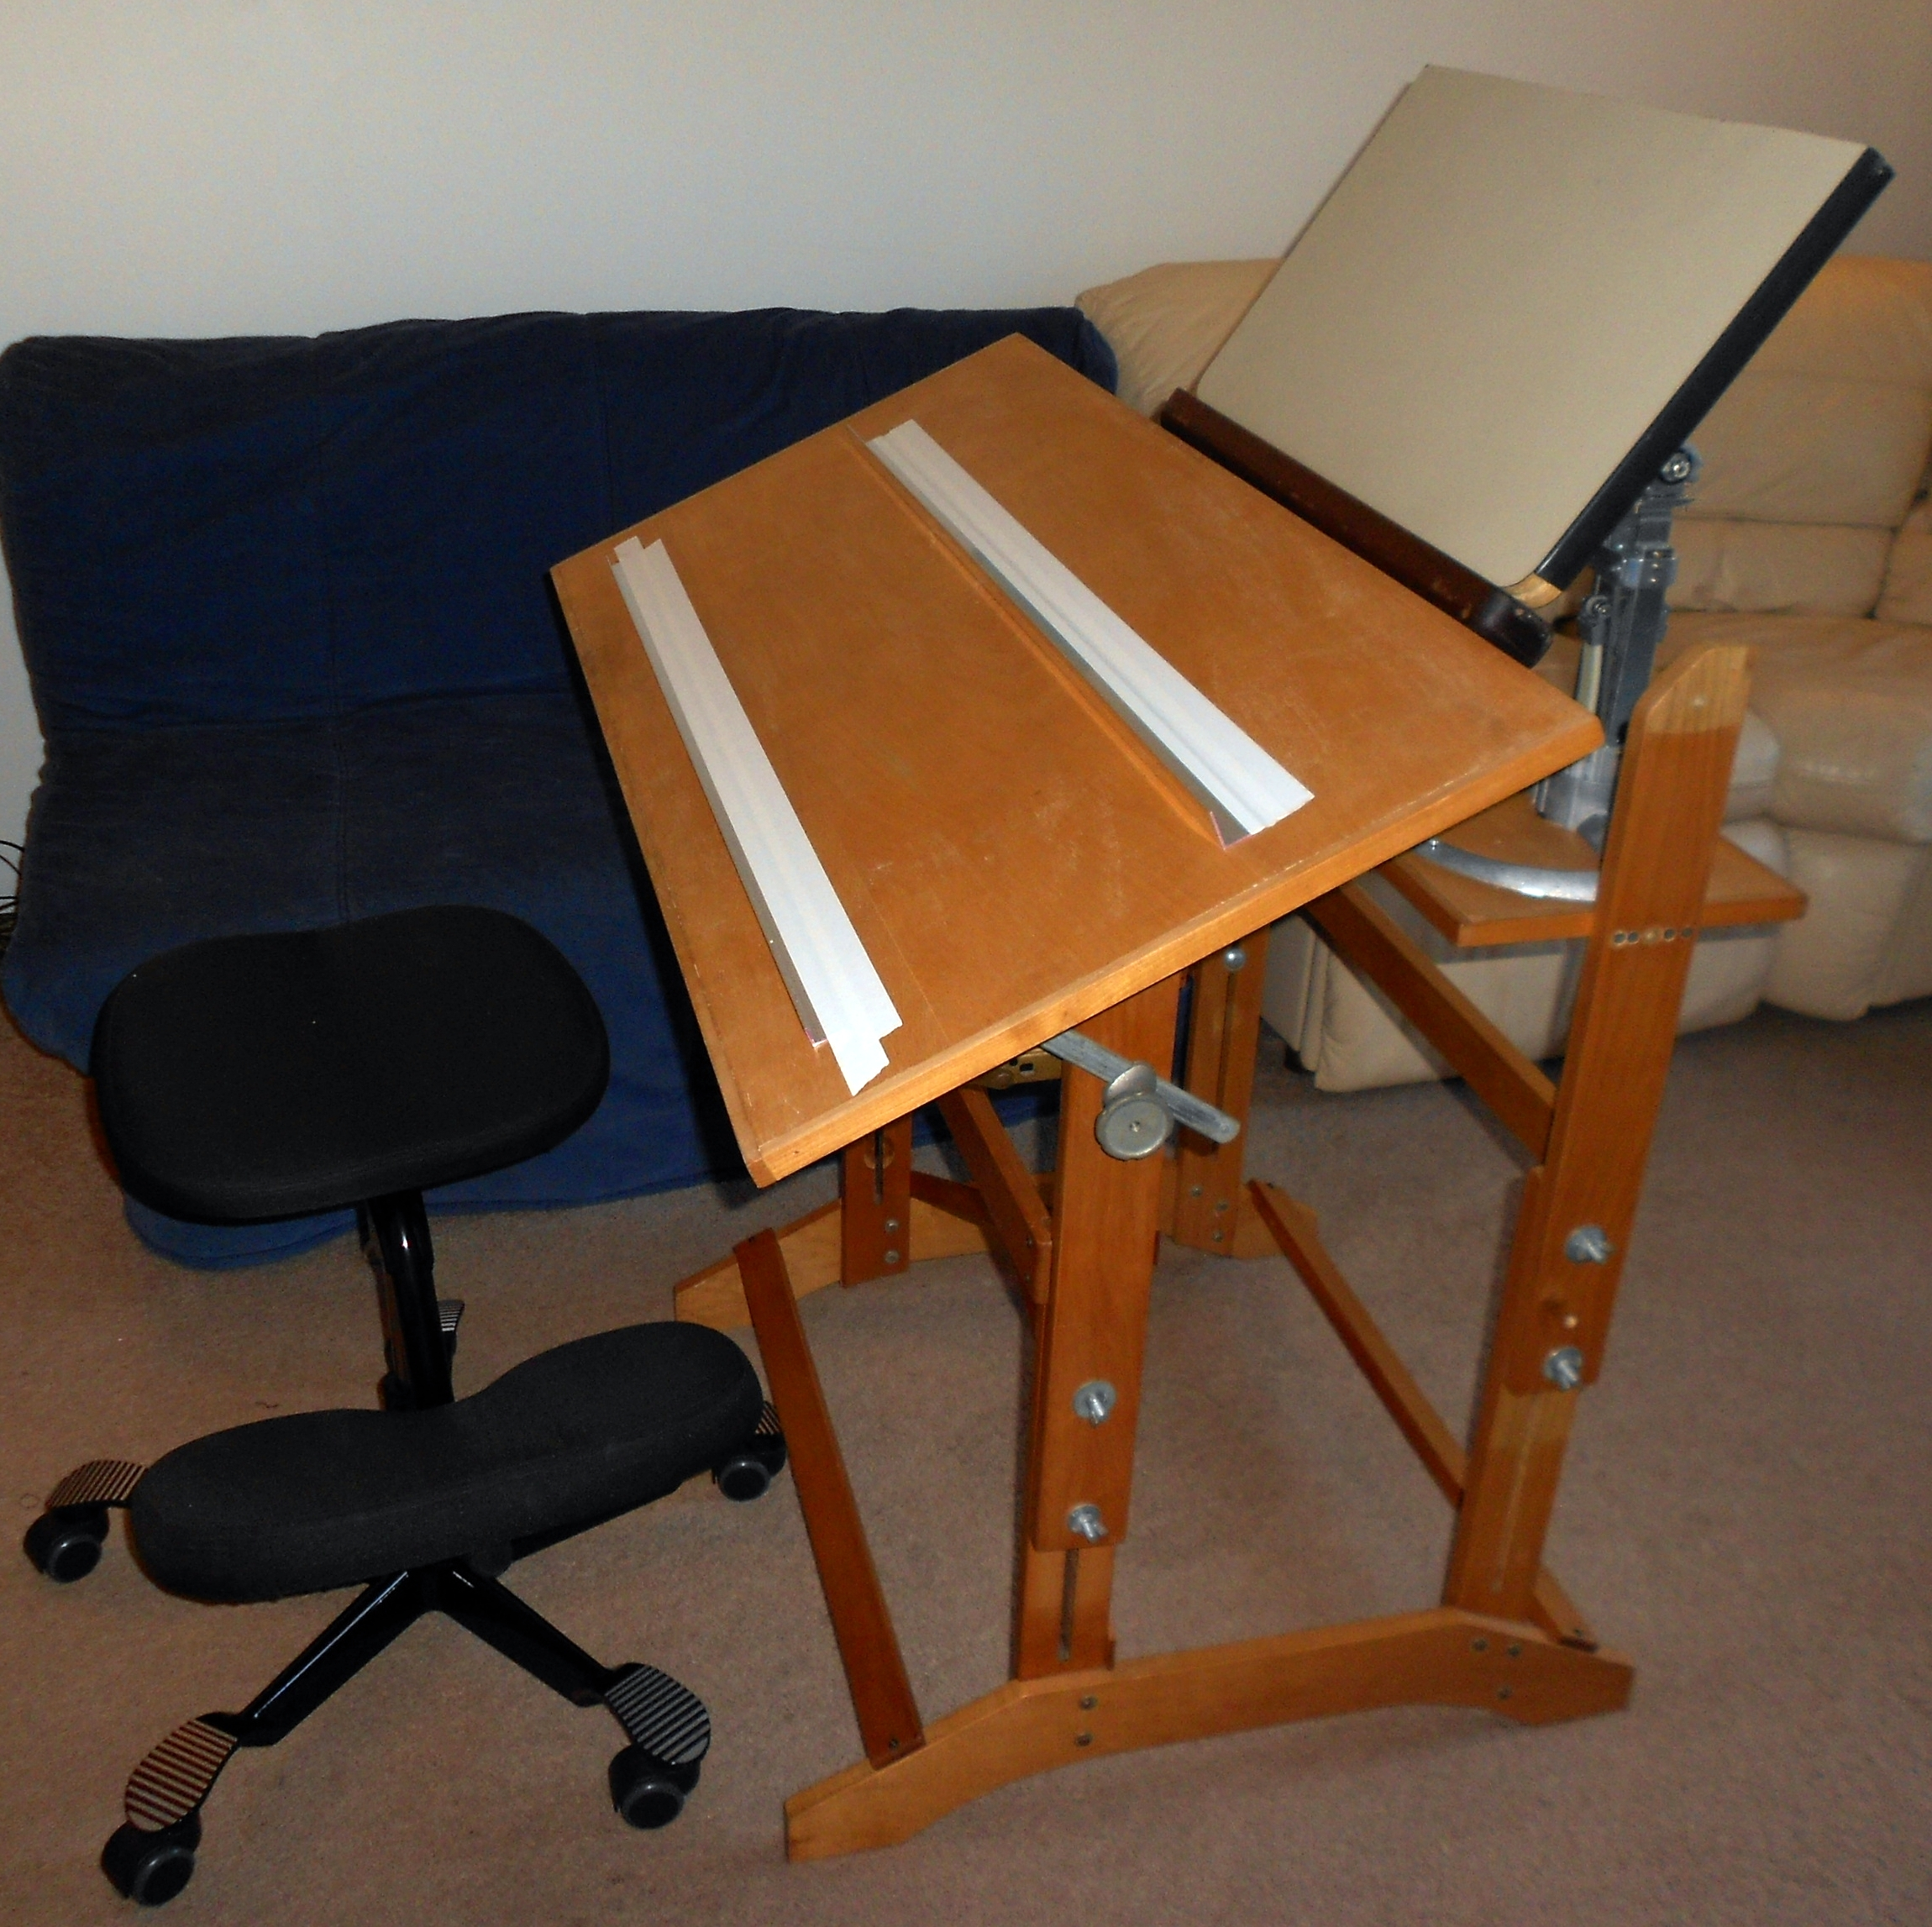 Turn a Drafting Table into a Study Juggernaut